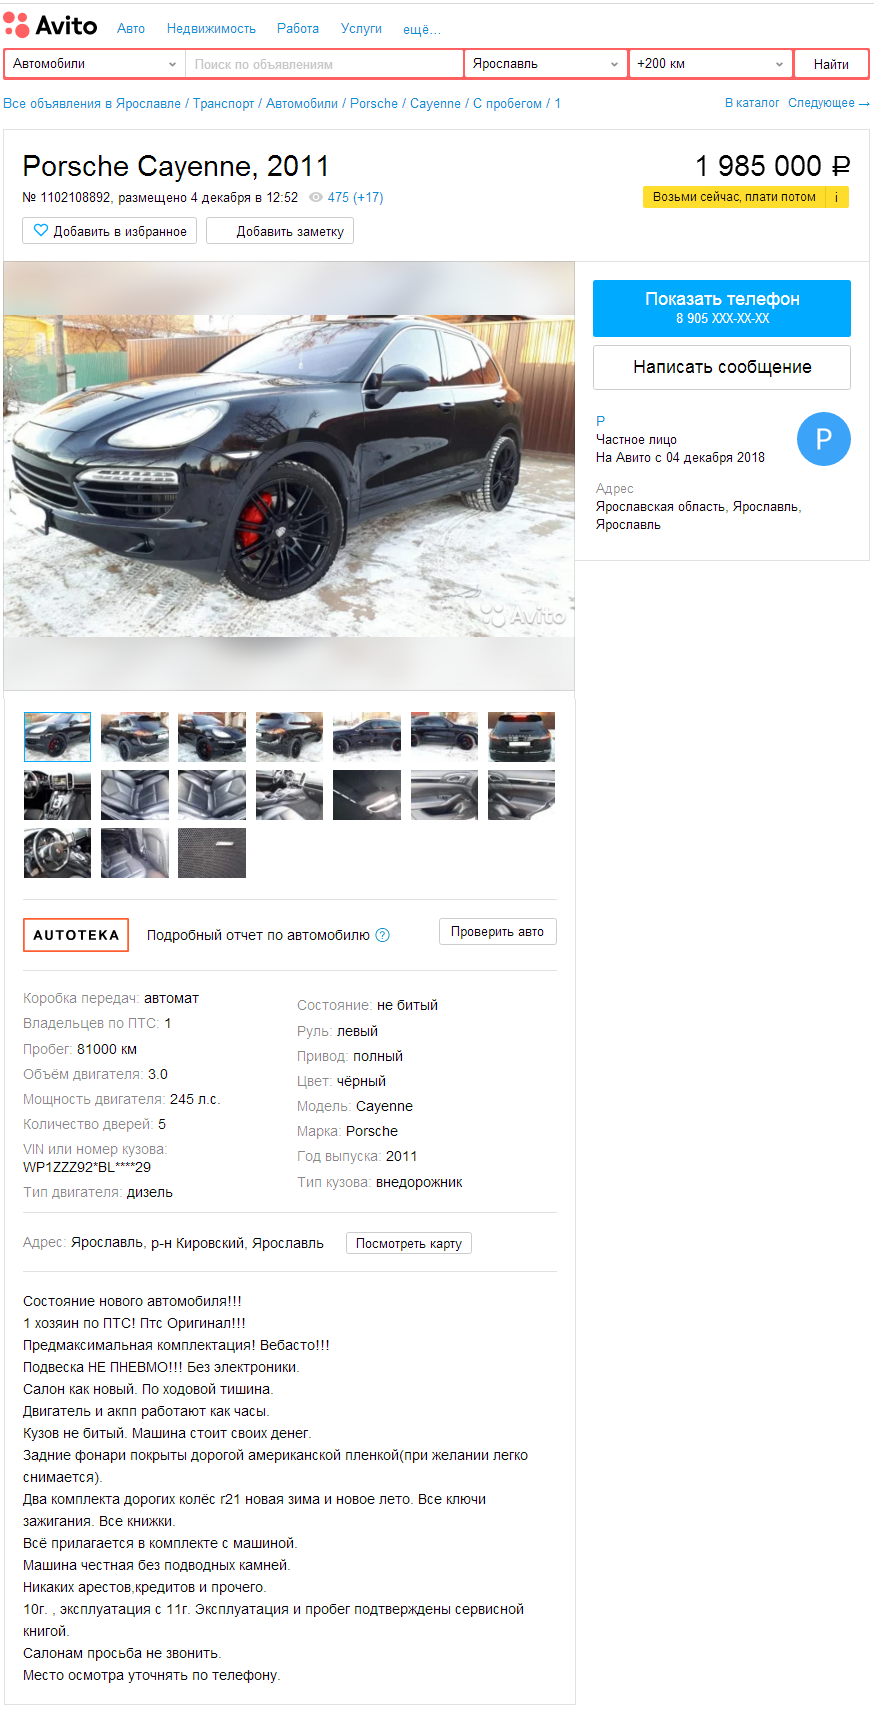 объявление о продаже Porsche Cayenne II